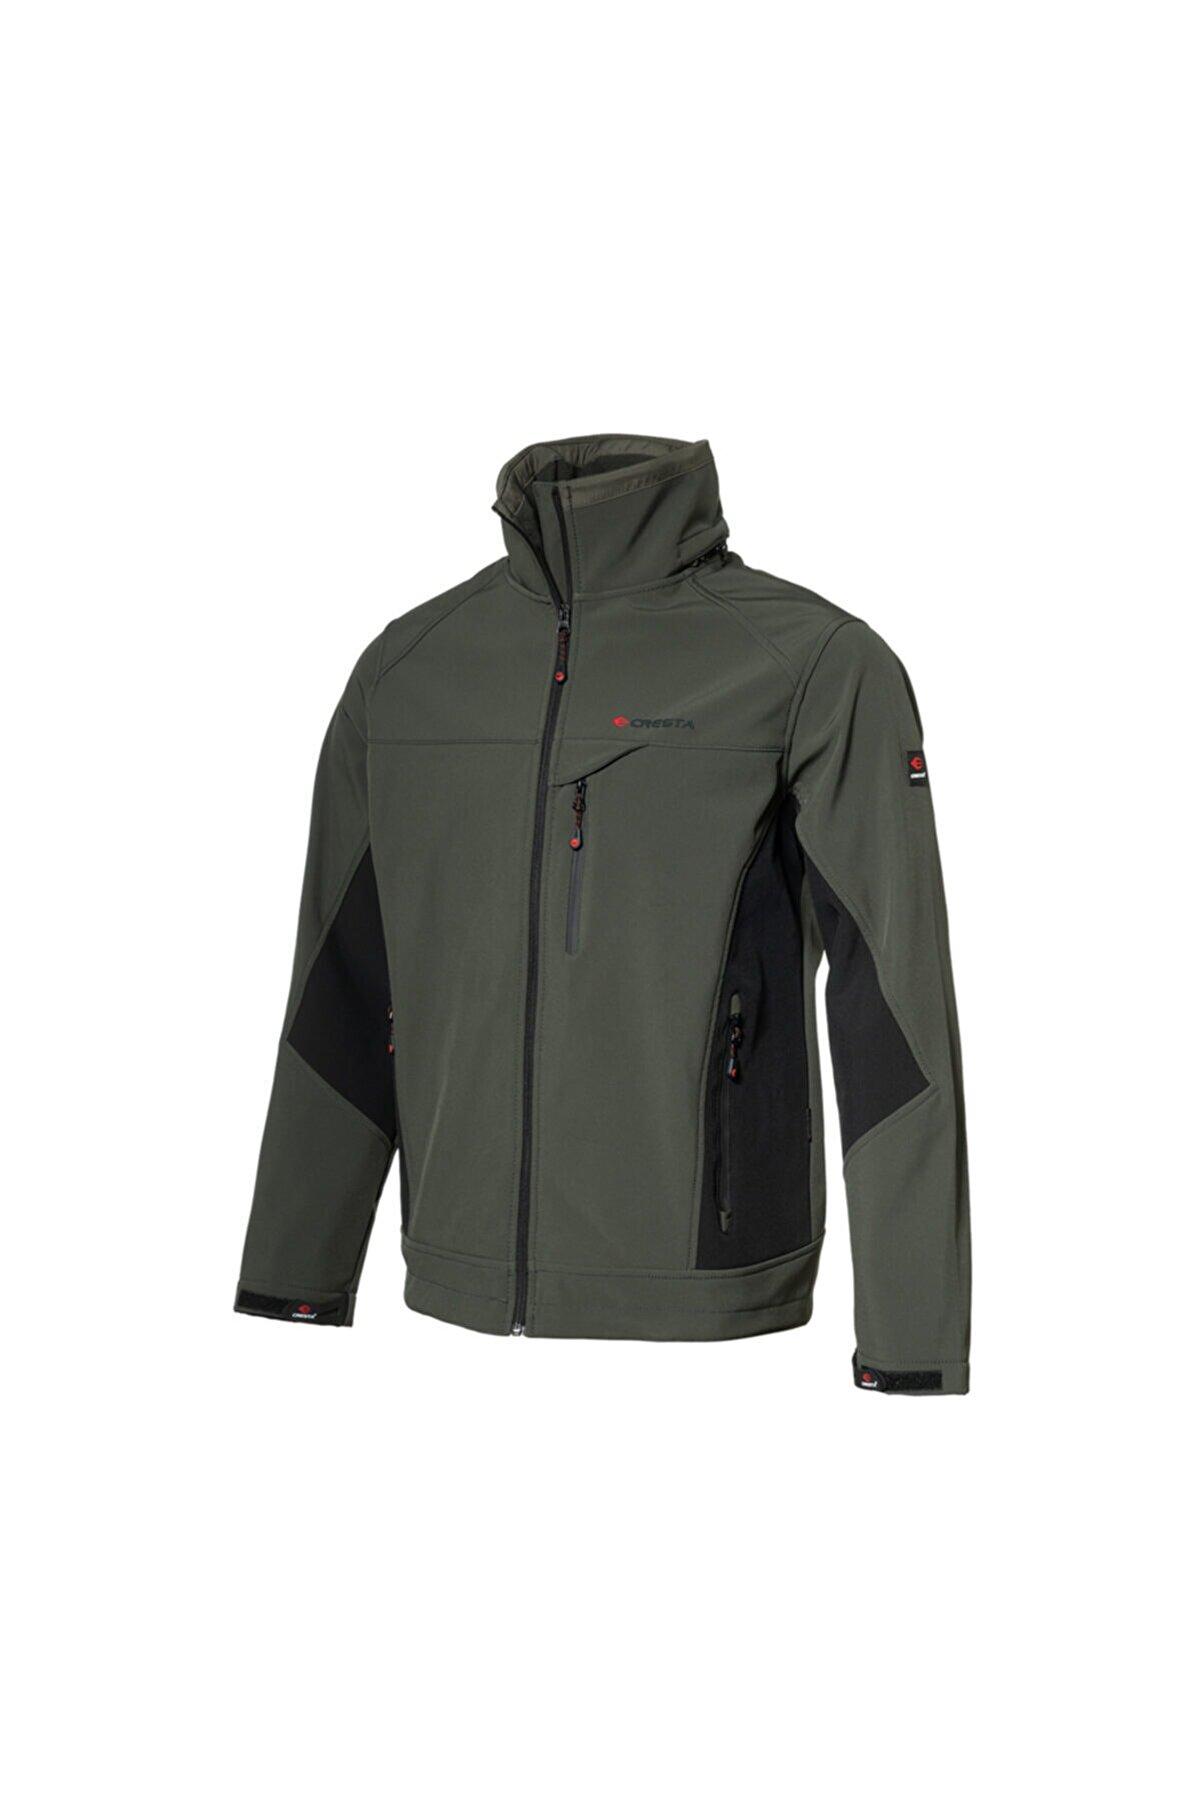 Cresta Outdoor Gizli Kapüşonlu Erkek Softshell Ceket